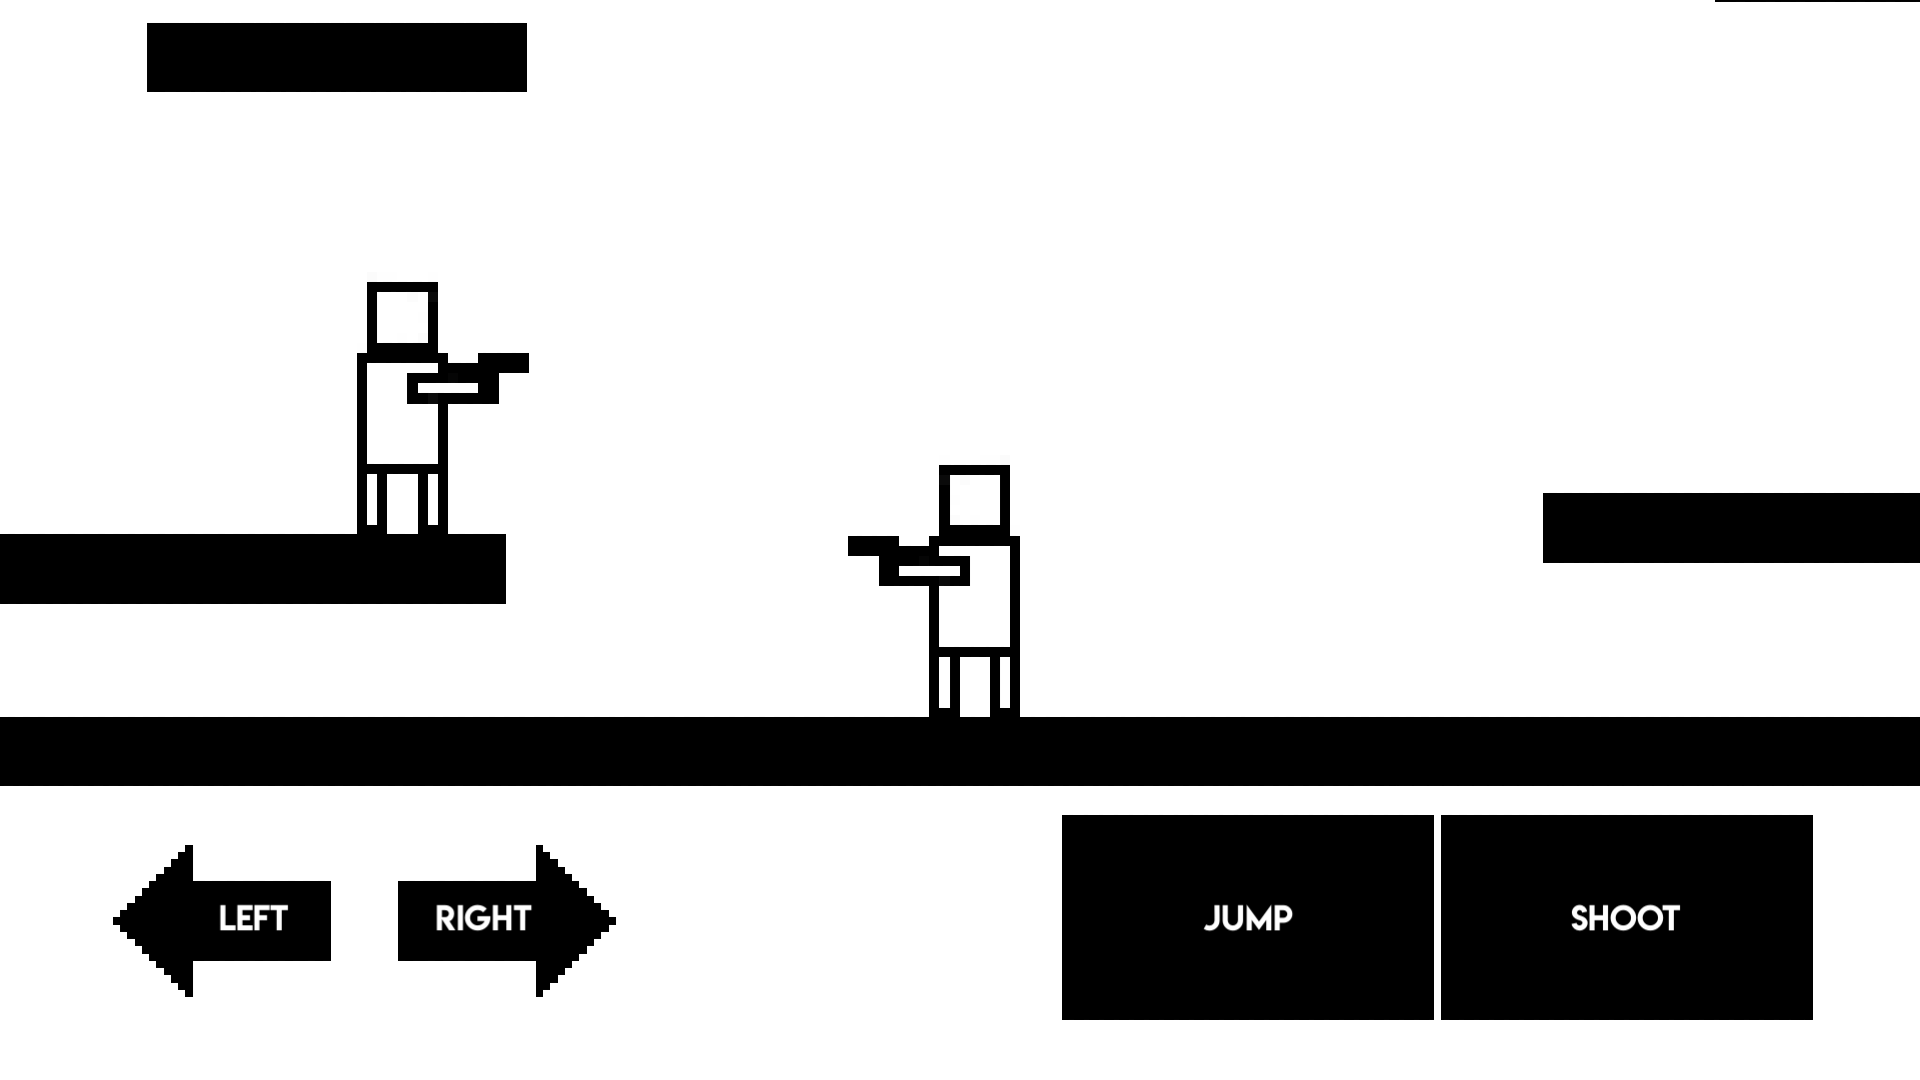 GitHub - SajedNahian/2D-Mobile-Multiplayer: My first multiplayer